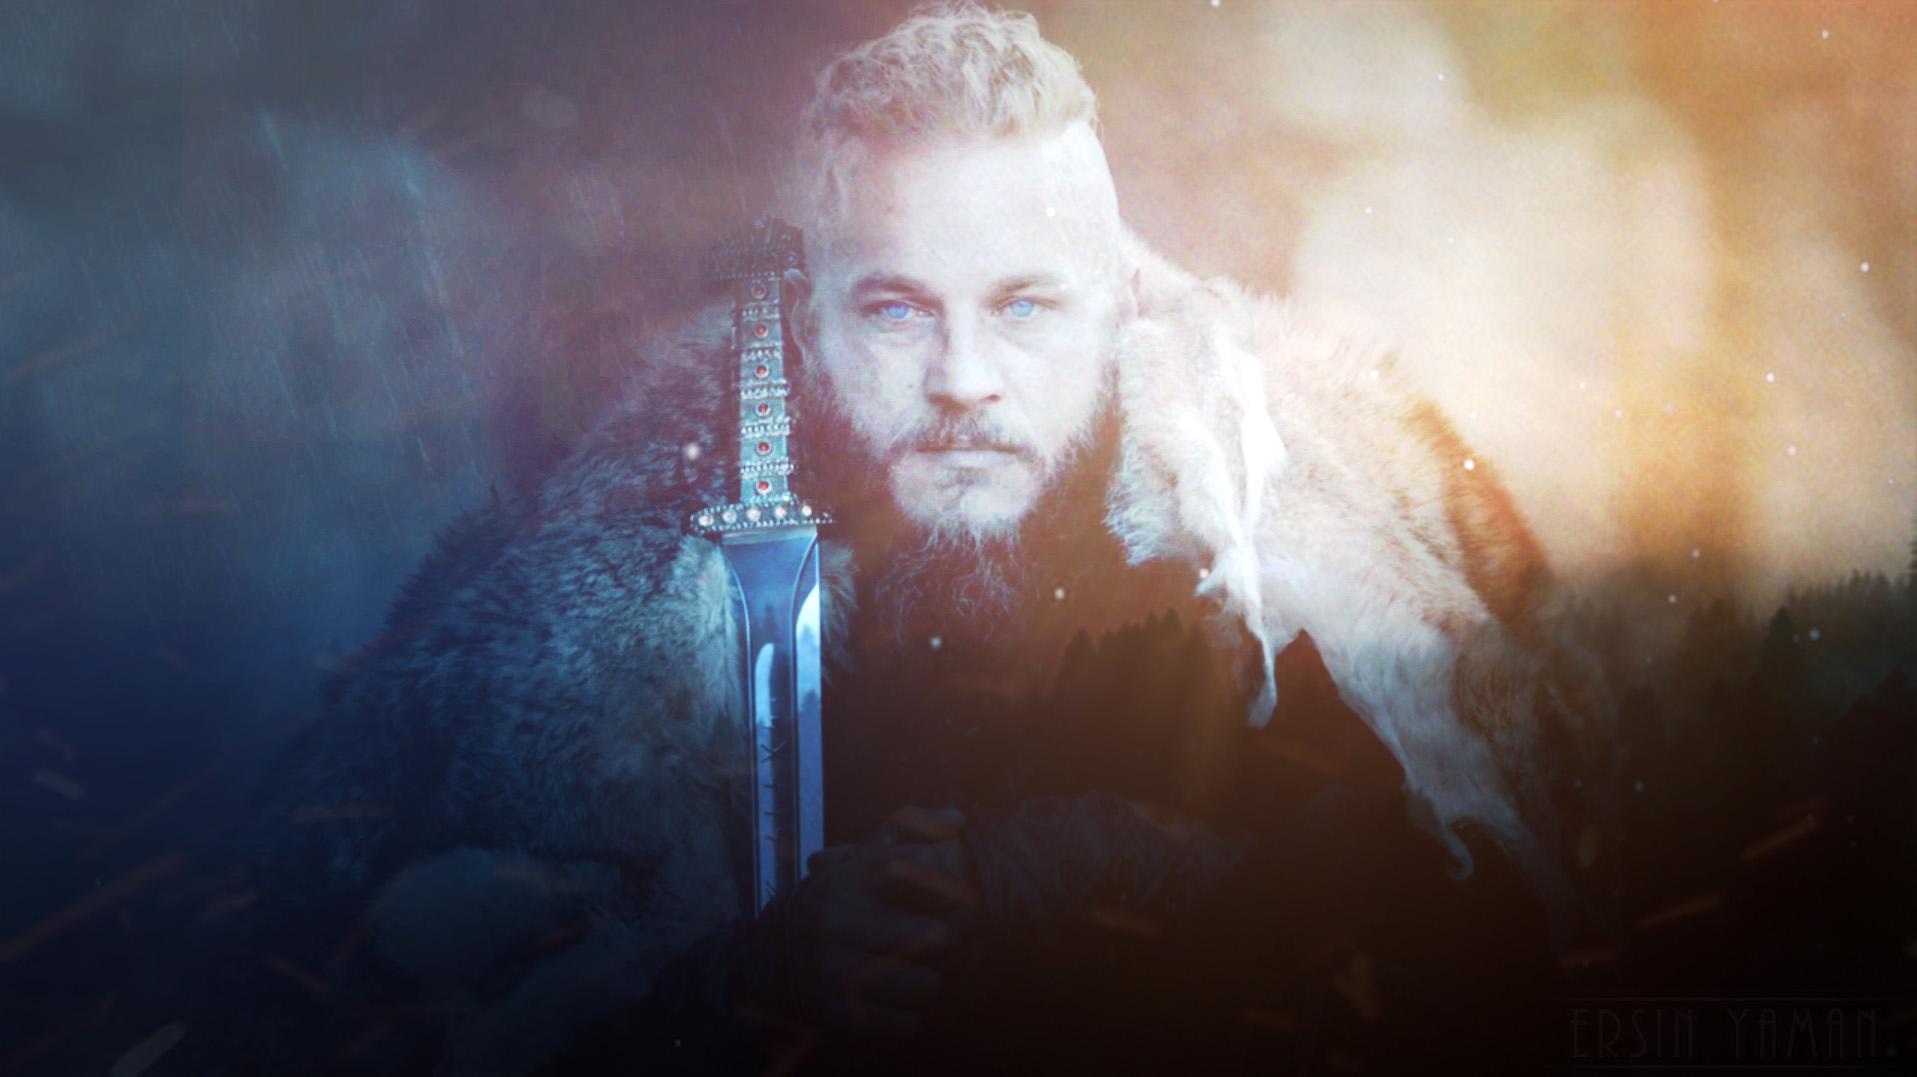 Vikings Ragnar Lothbrok Fondo De Pantalla And Fondo De